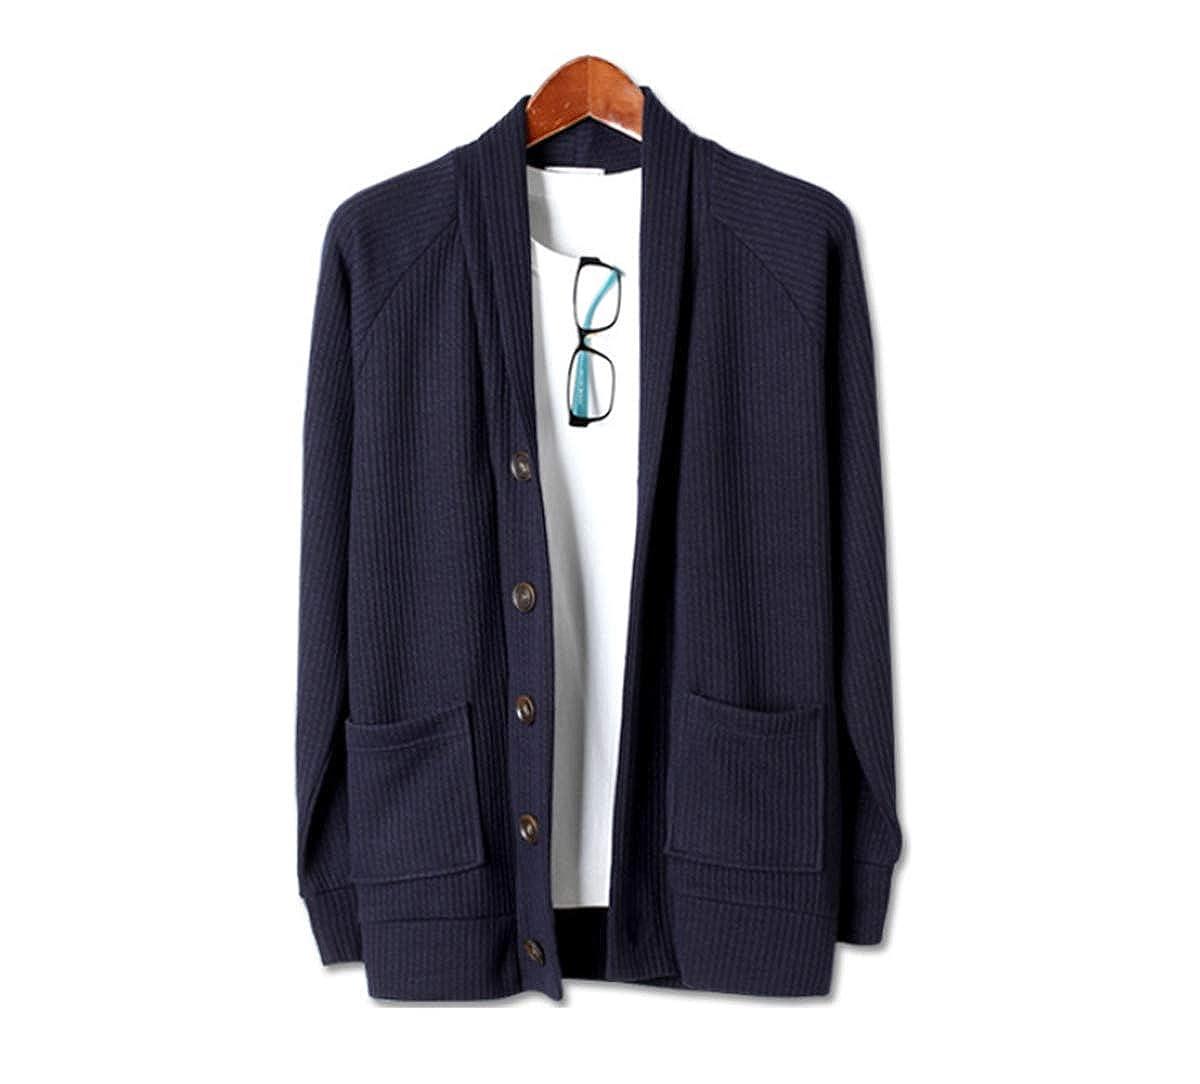 Mens Premium Canyon Shawl Collar Pocket V Neck Button Knit Cardigan Sweater Jumper